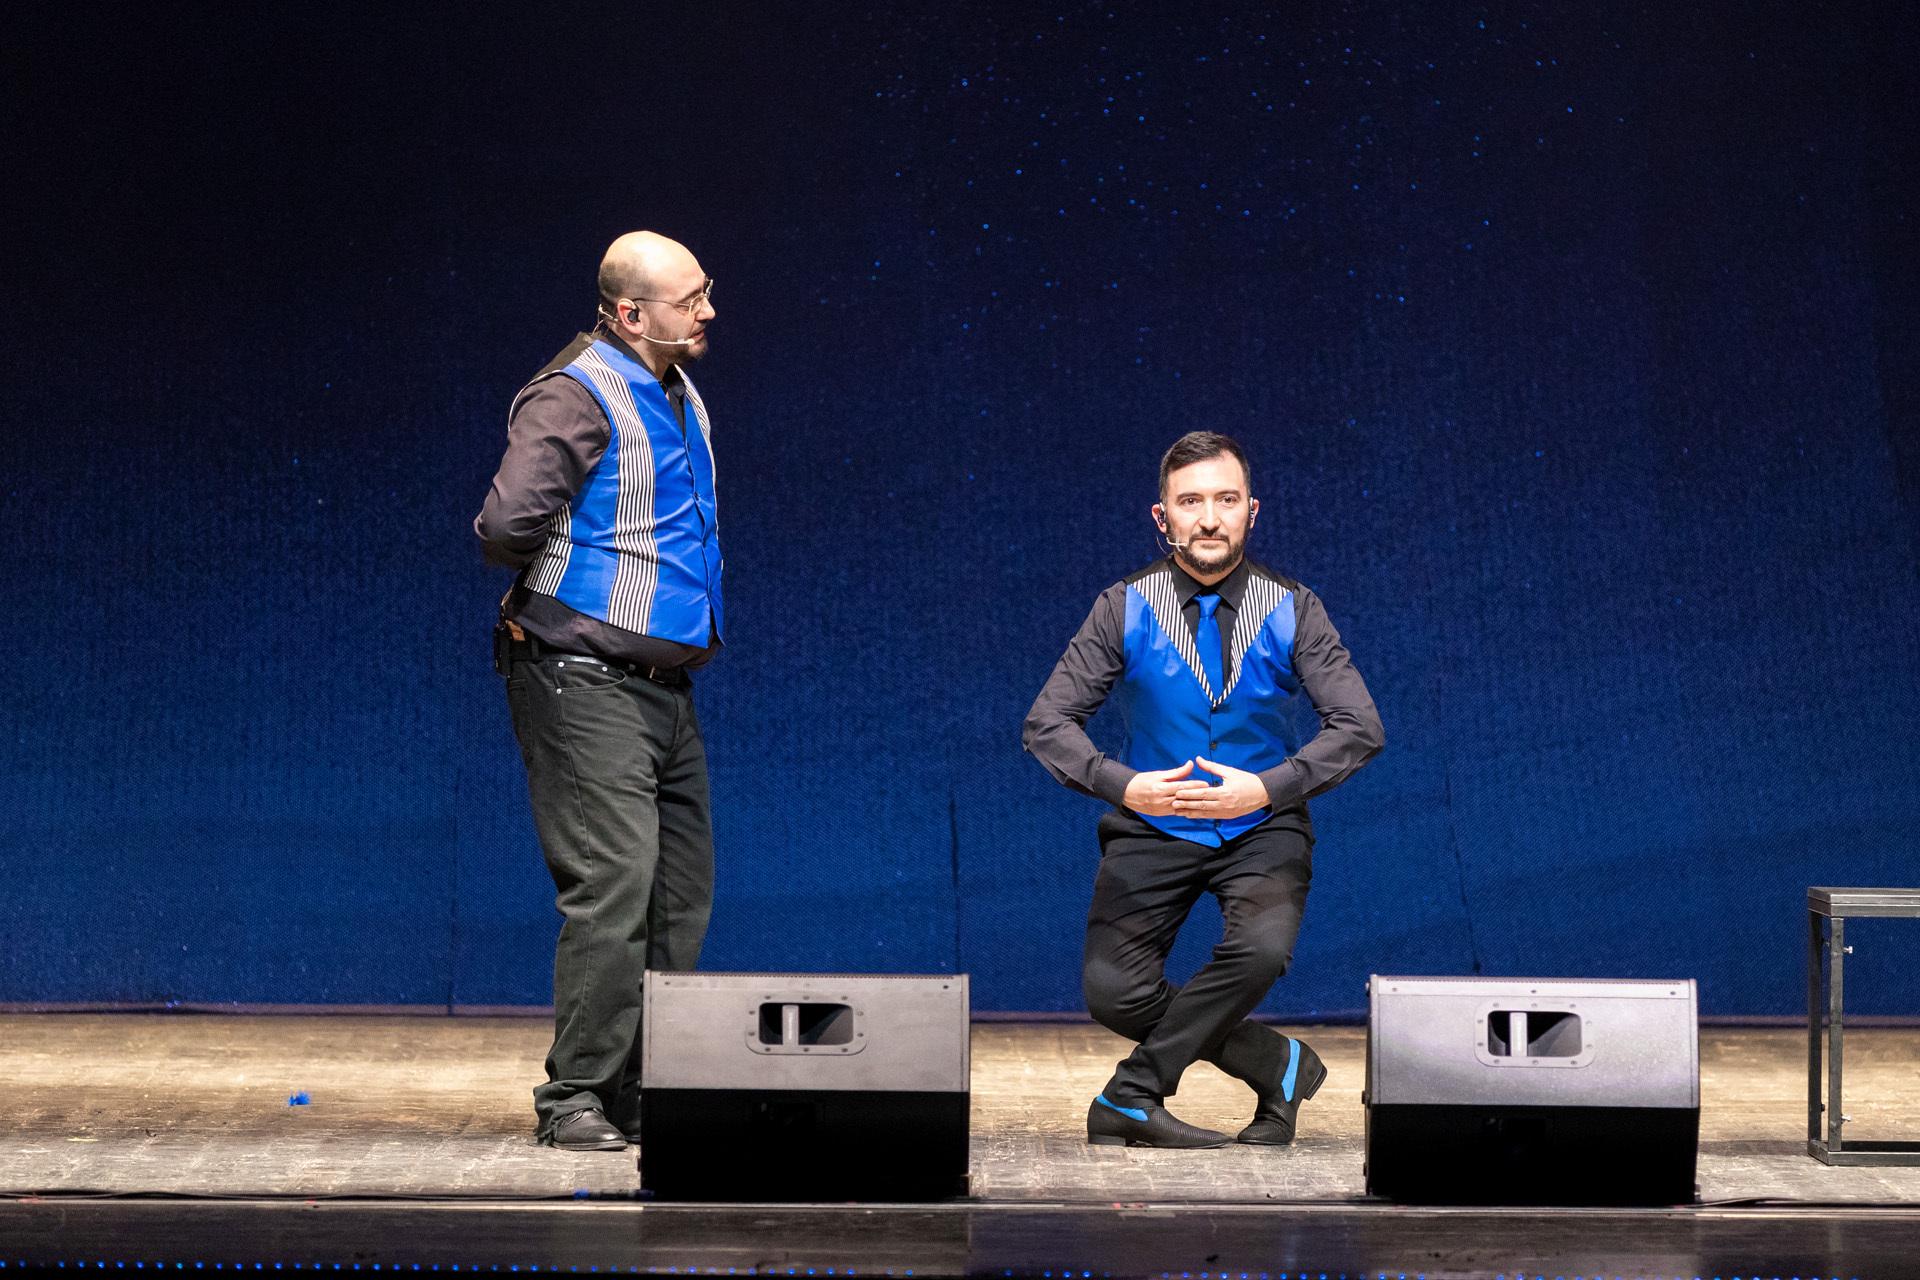 2019_03_12-Blue-Il-Musical-©-Luca-Vantusso-212507-EOSR4014